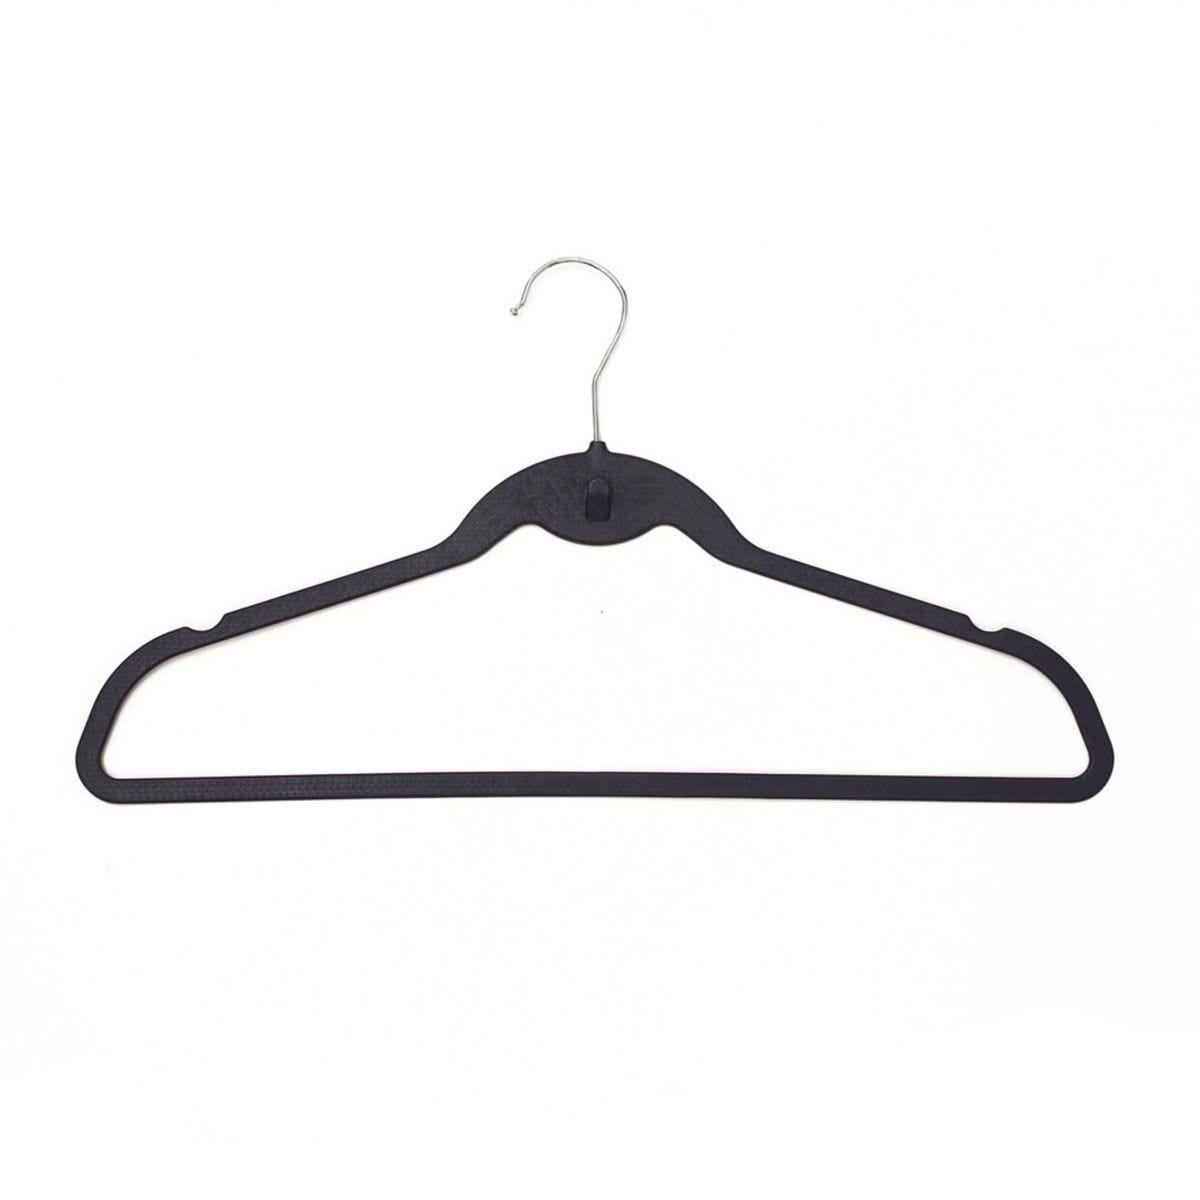 JVL Blue Plastic Space Saving Coat Hangers - Pack of 60